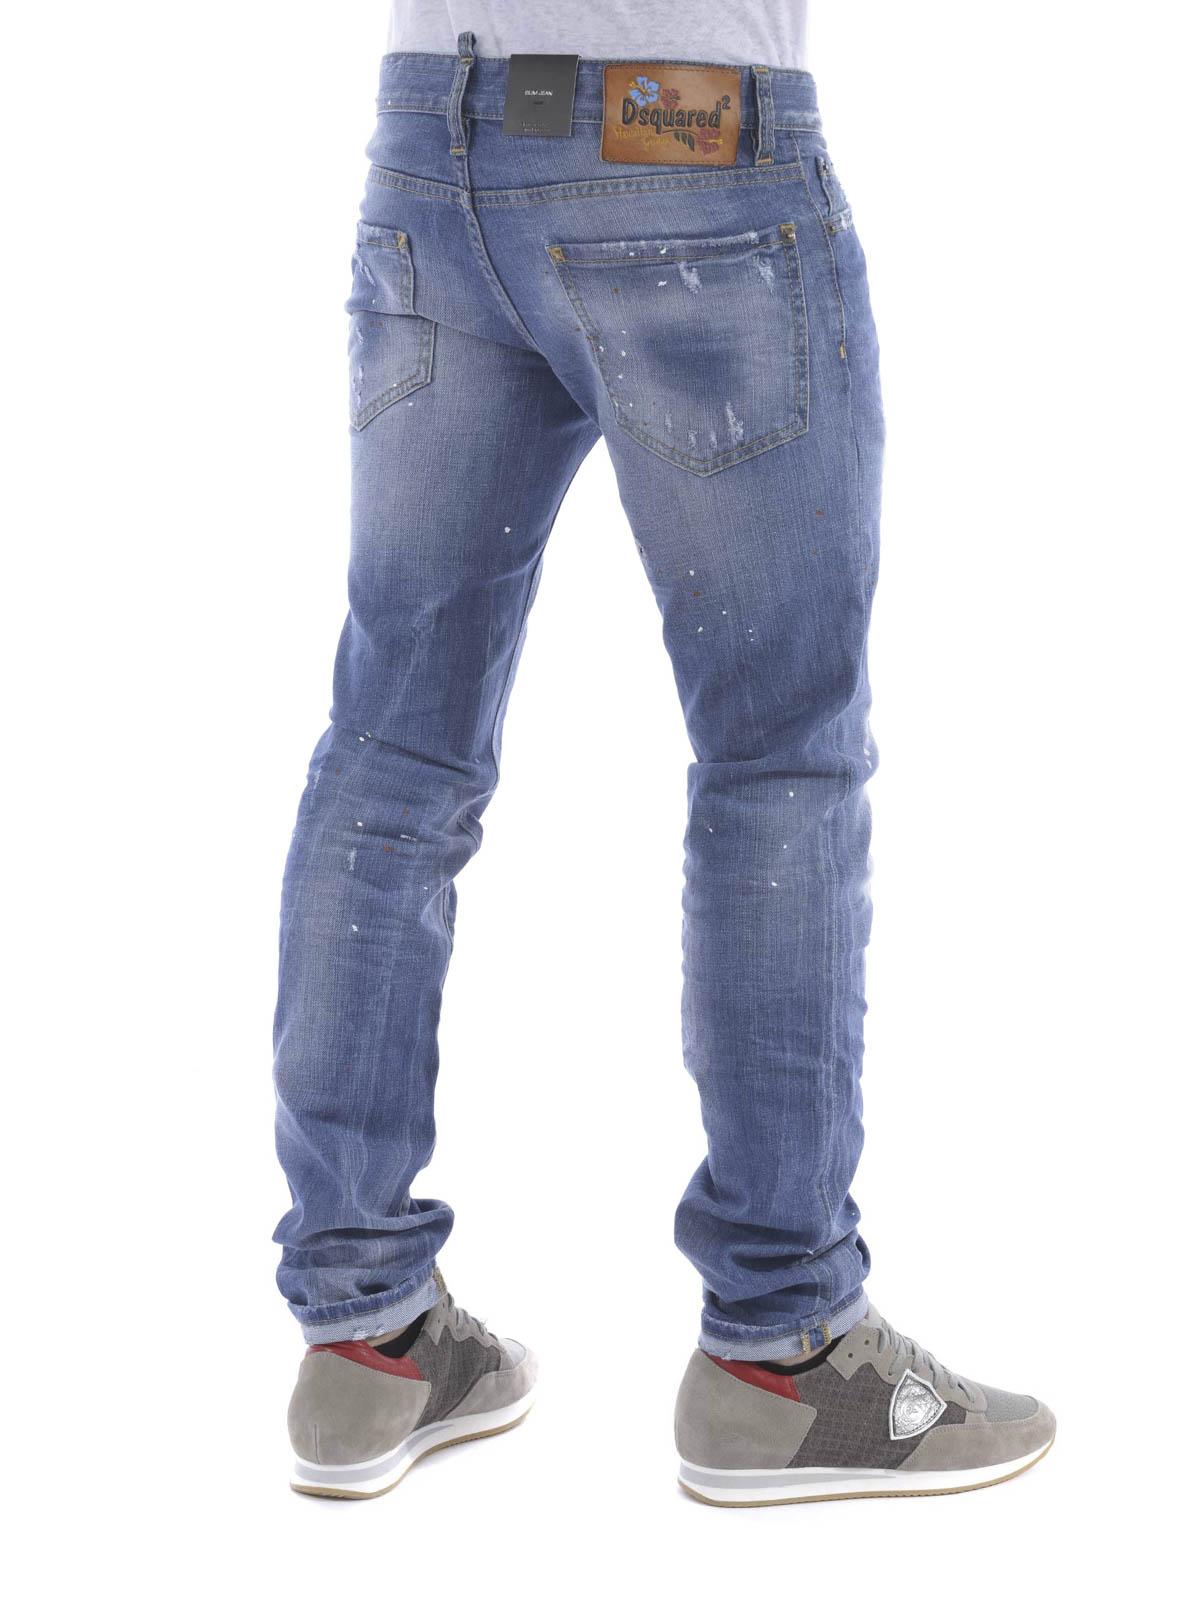 a2b6242b13 Dsquared2 - Slim jeans - straight leg jeans - S71LB0090 S30144-470